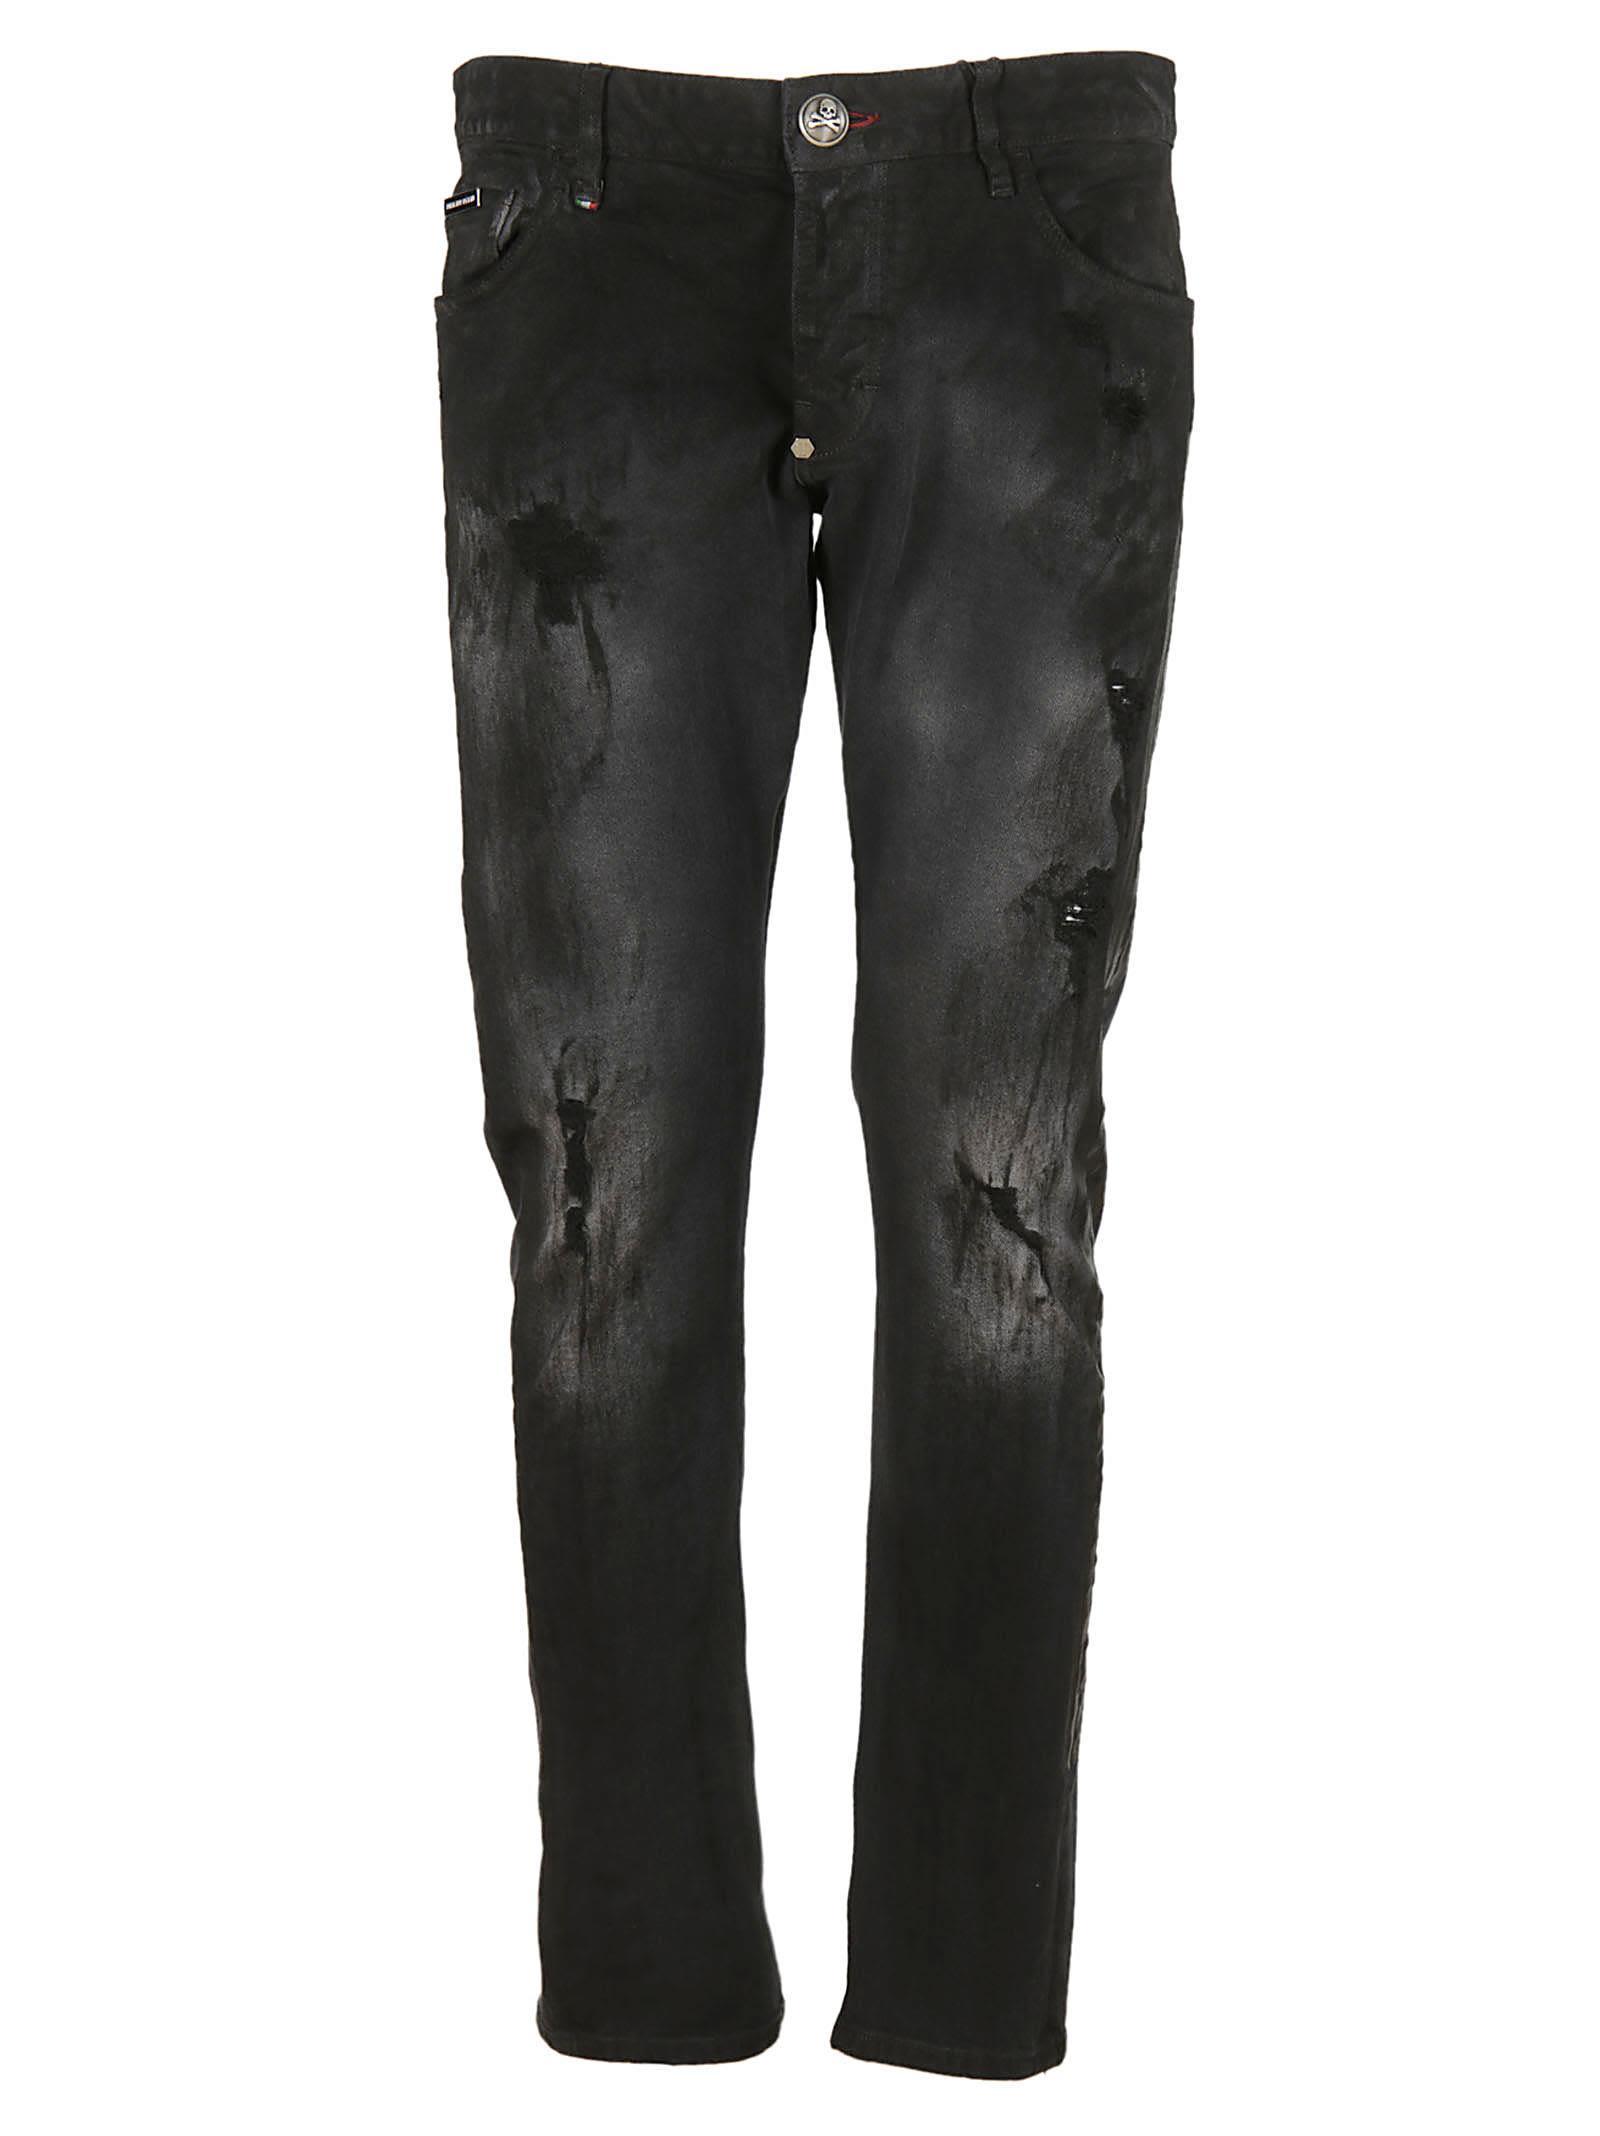 Philipp Plein Stitched Jeans